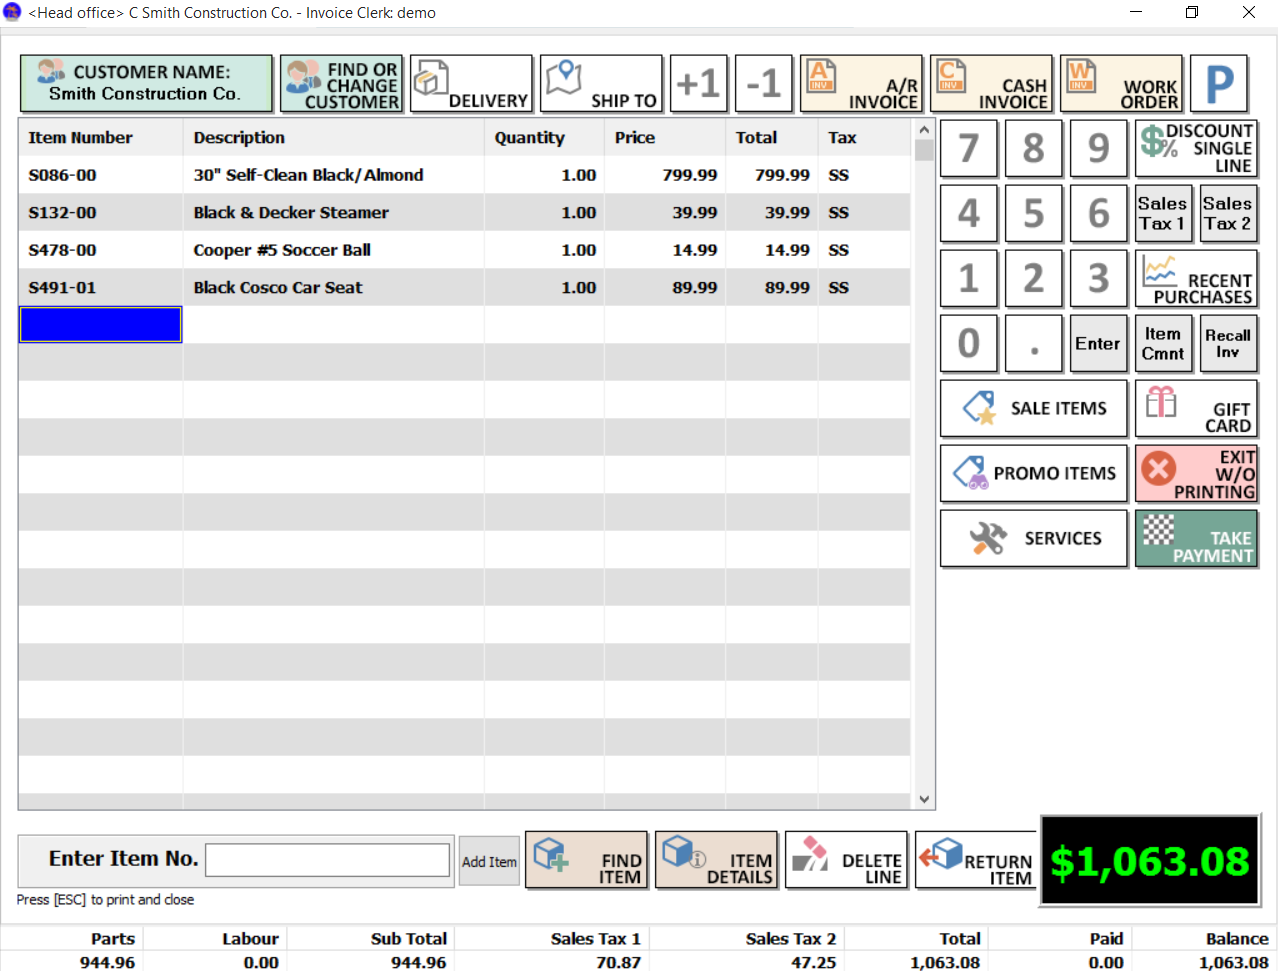 Windward System Five Software - Customer invoice